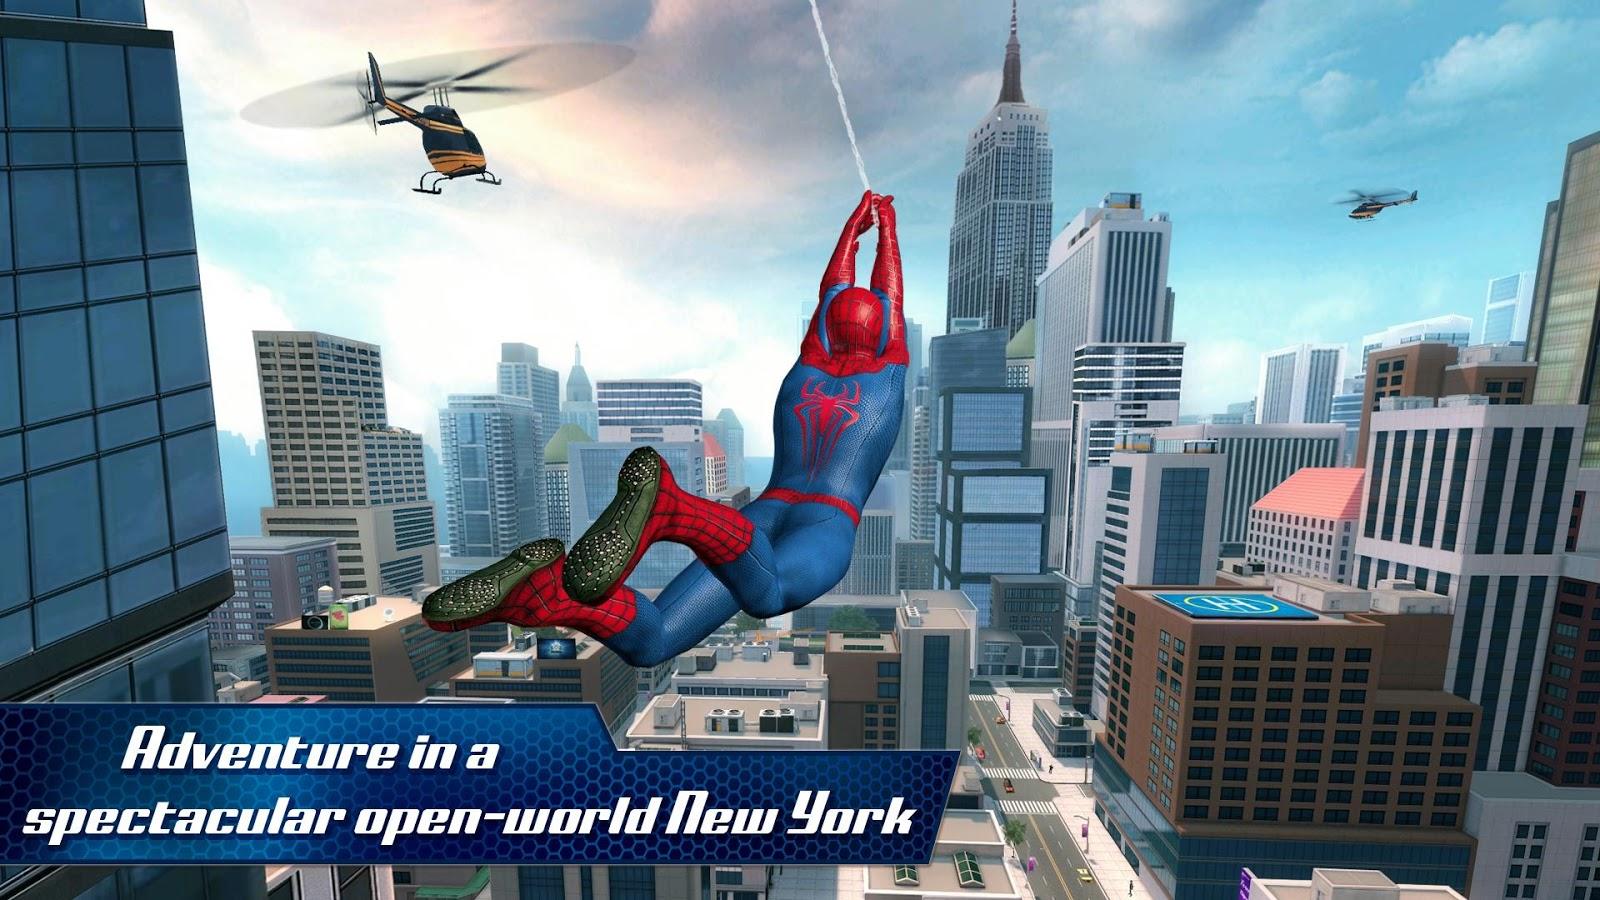 The Amazing Spider-Man 2 تحميل سبايدر مان للاندرويد برابط مباشر